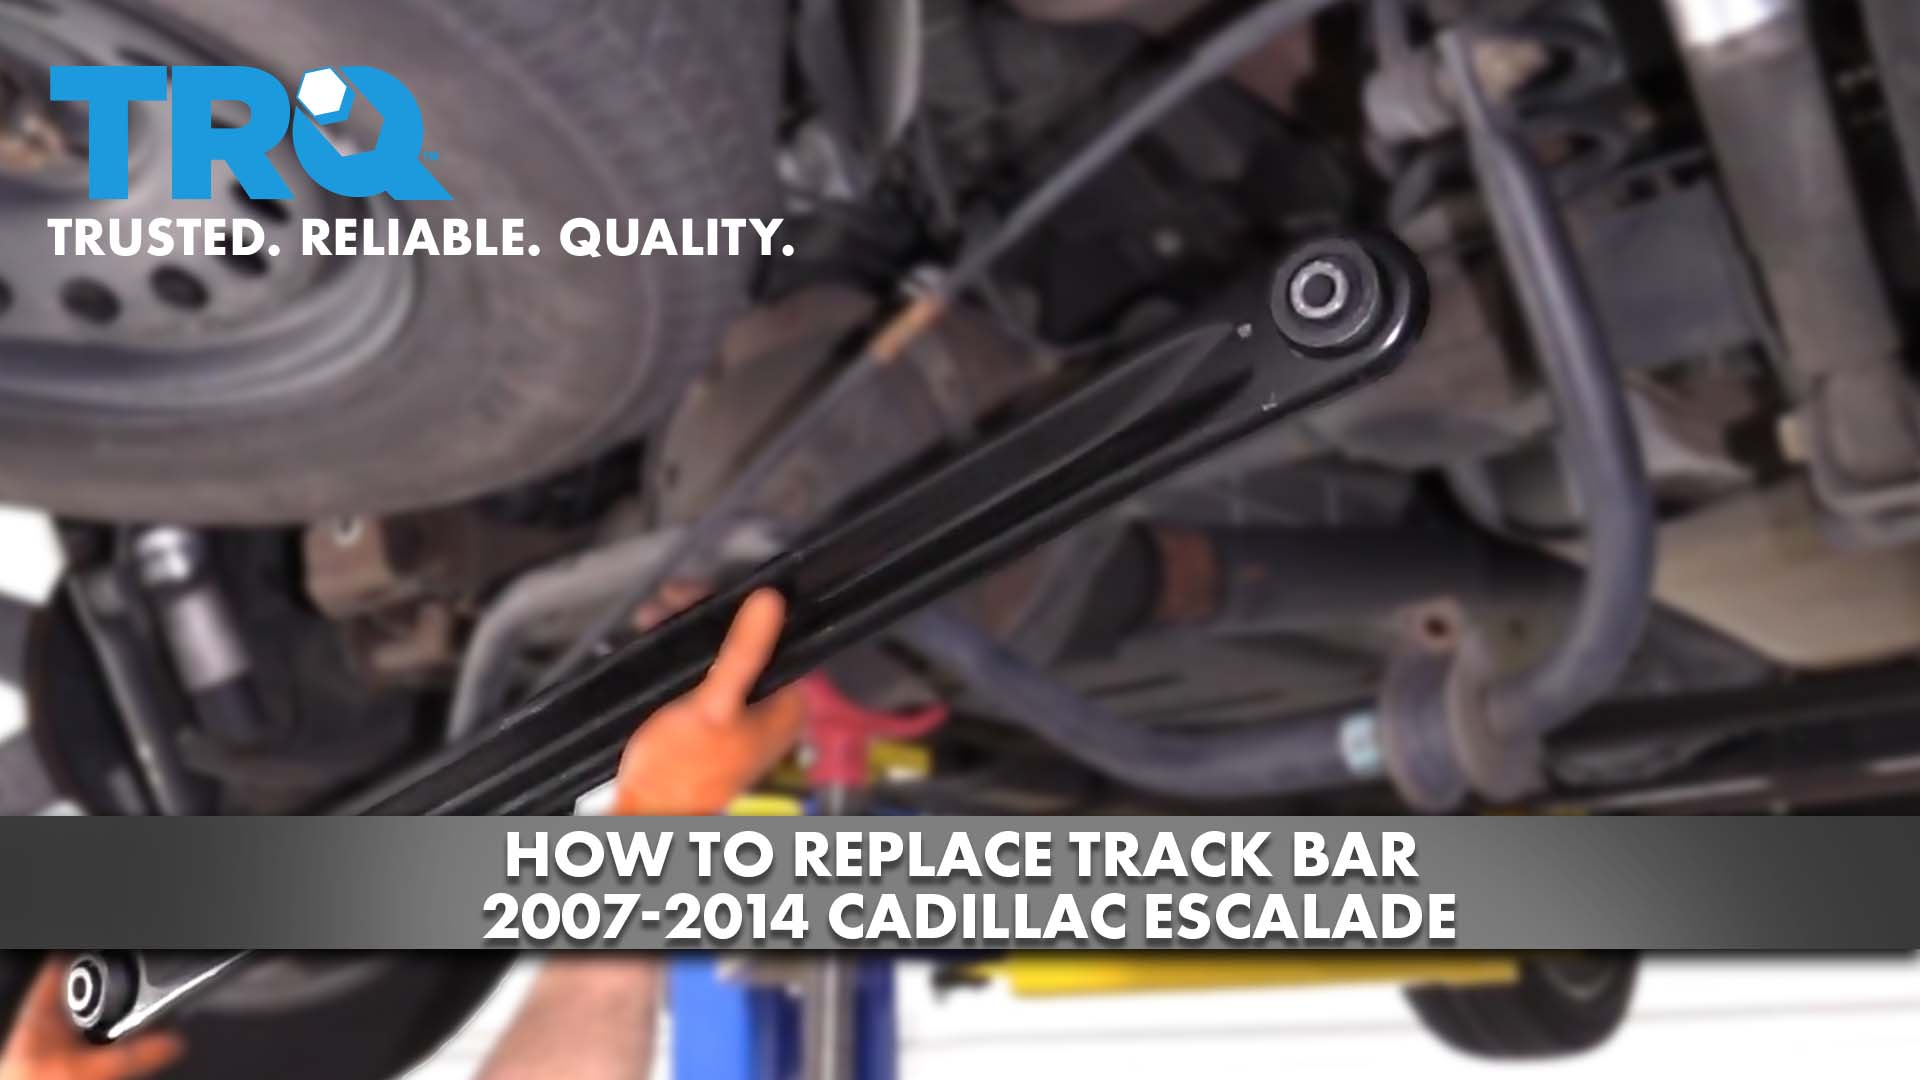 How To Replace Track Bar 2007-14 Cadillac Escalade